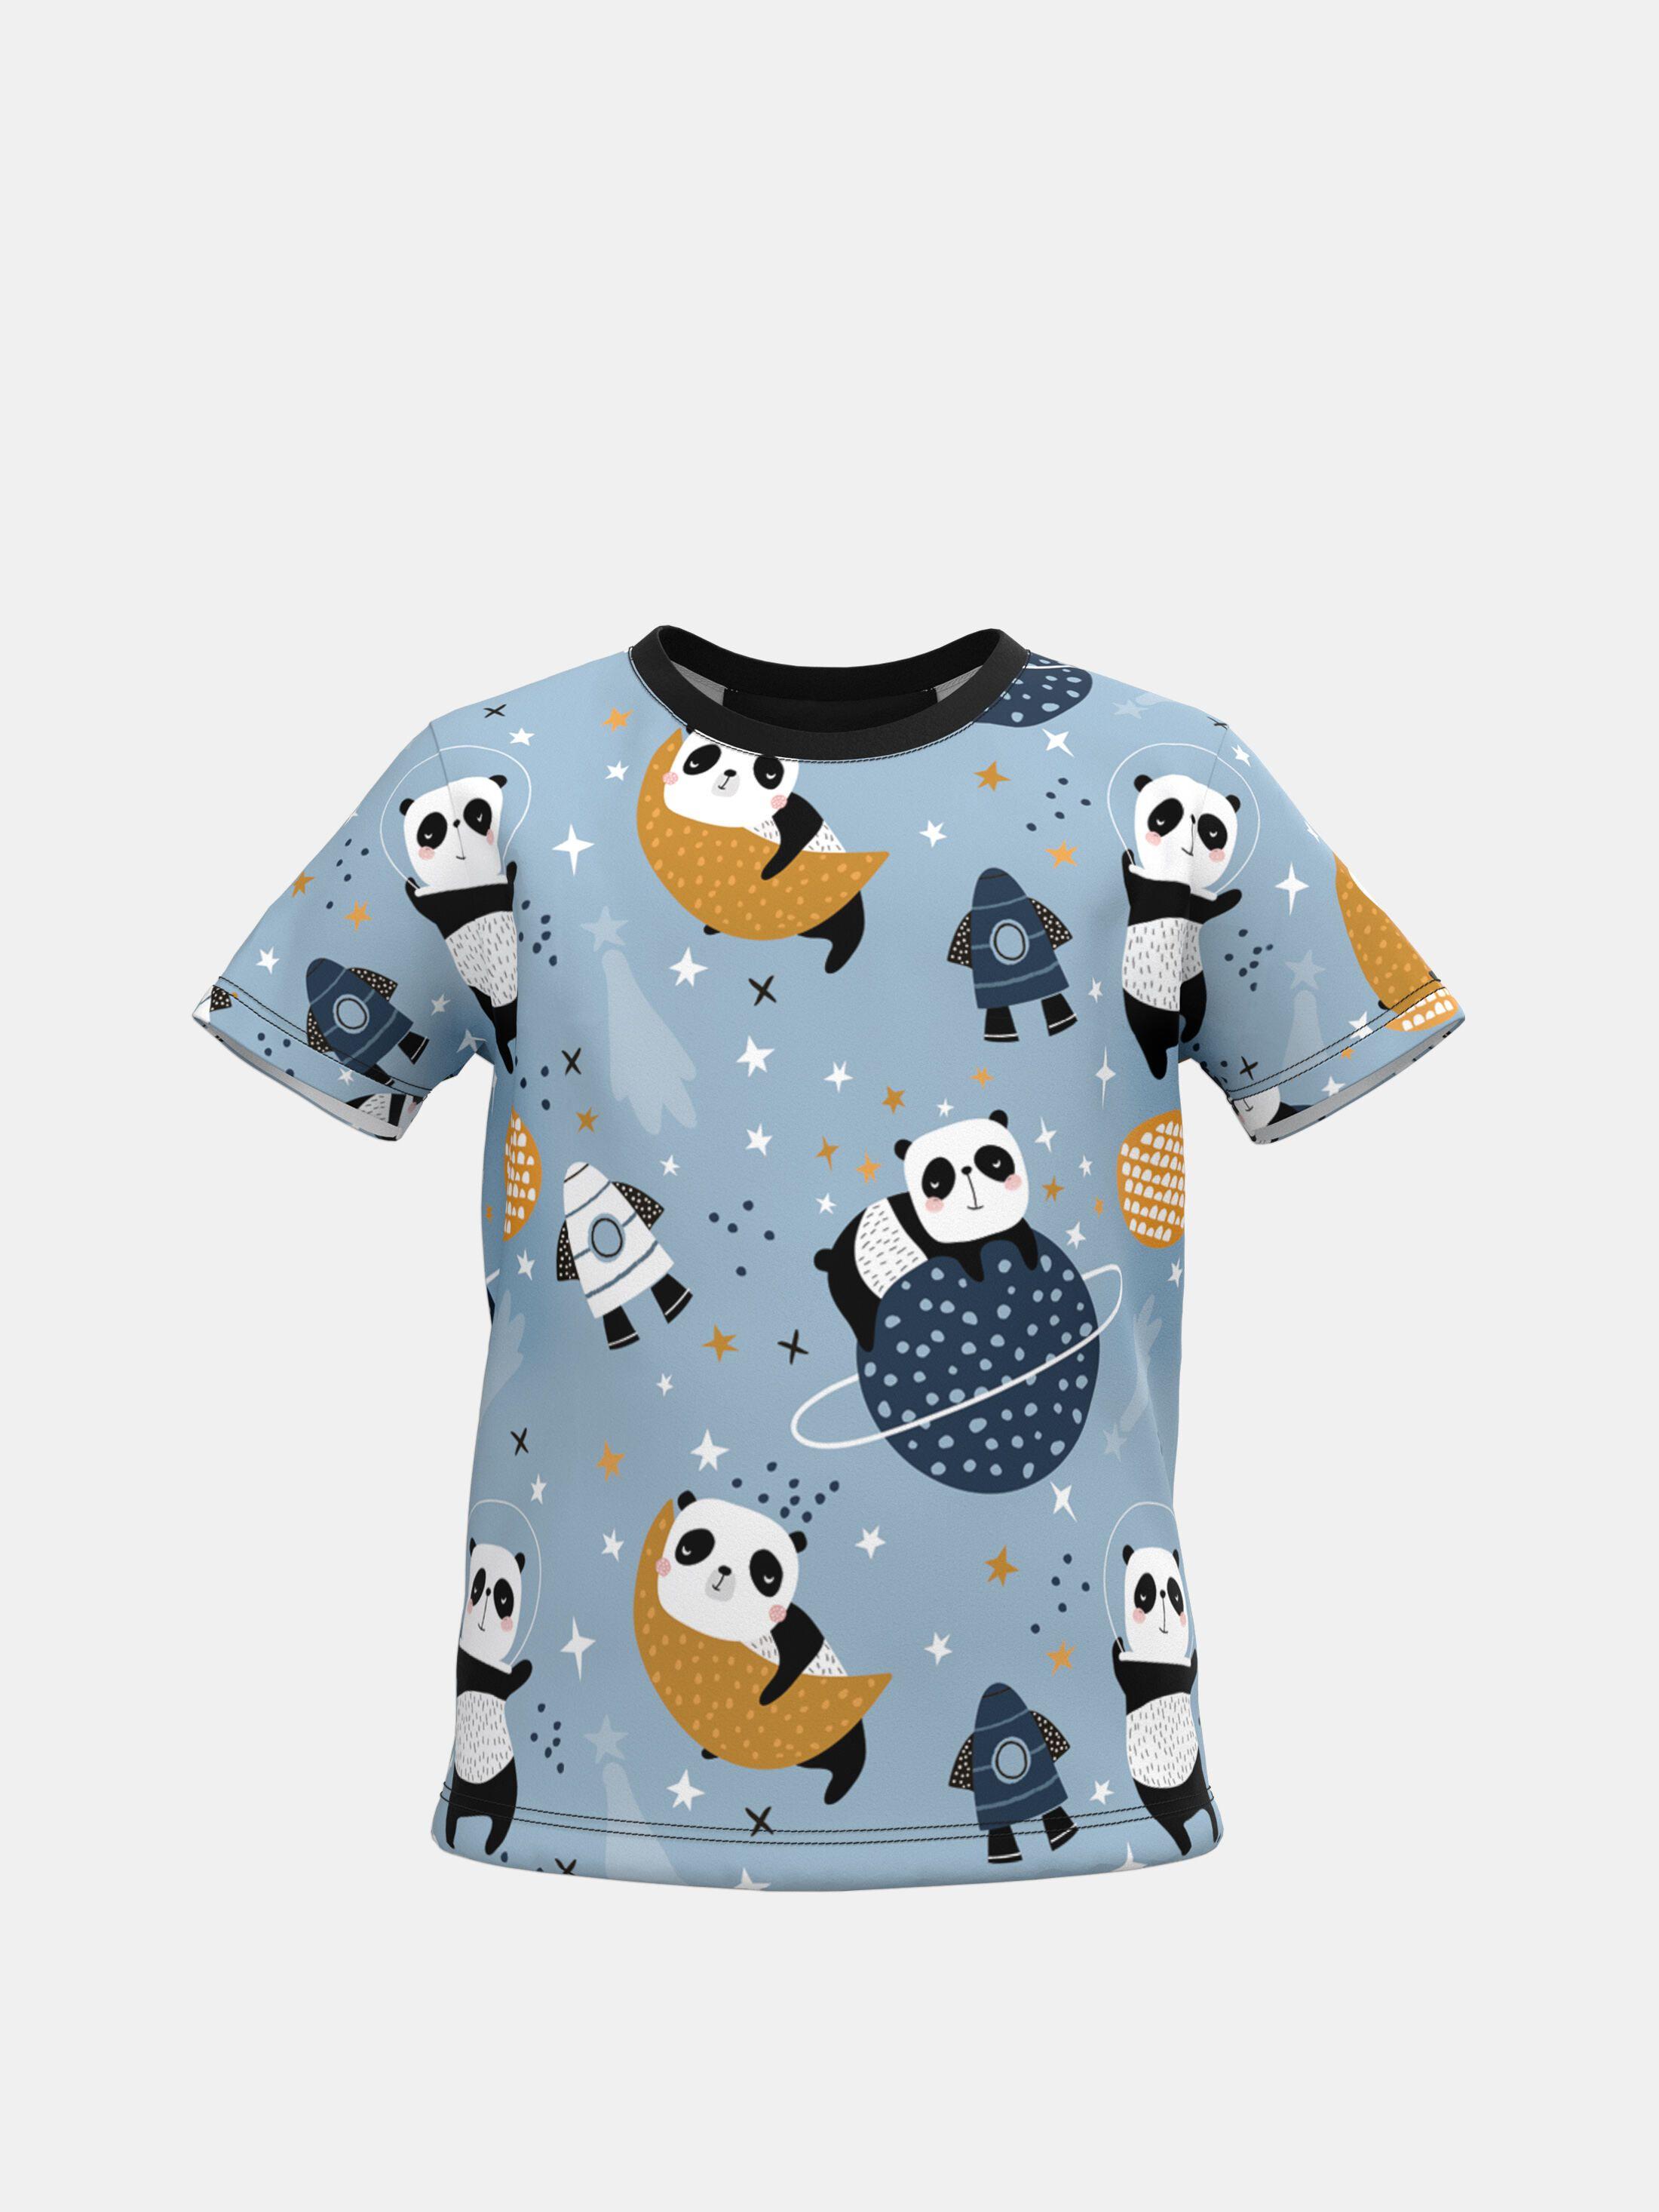 custom childrens t shirts